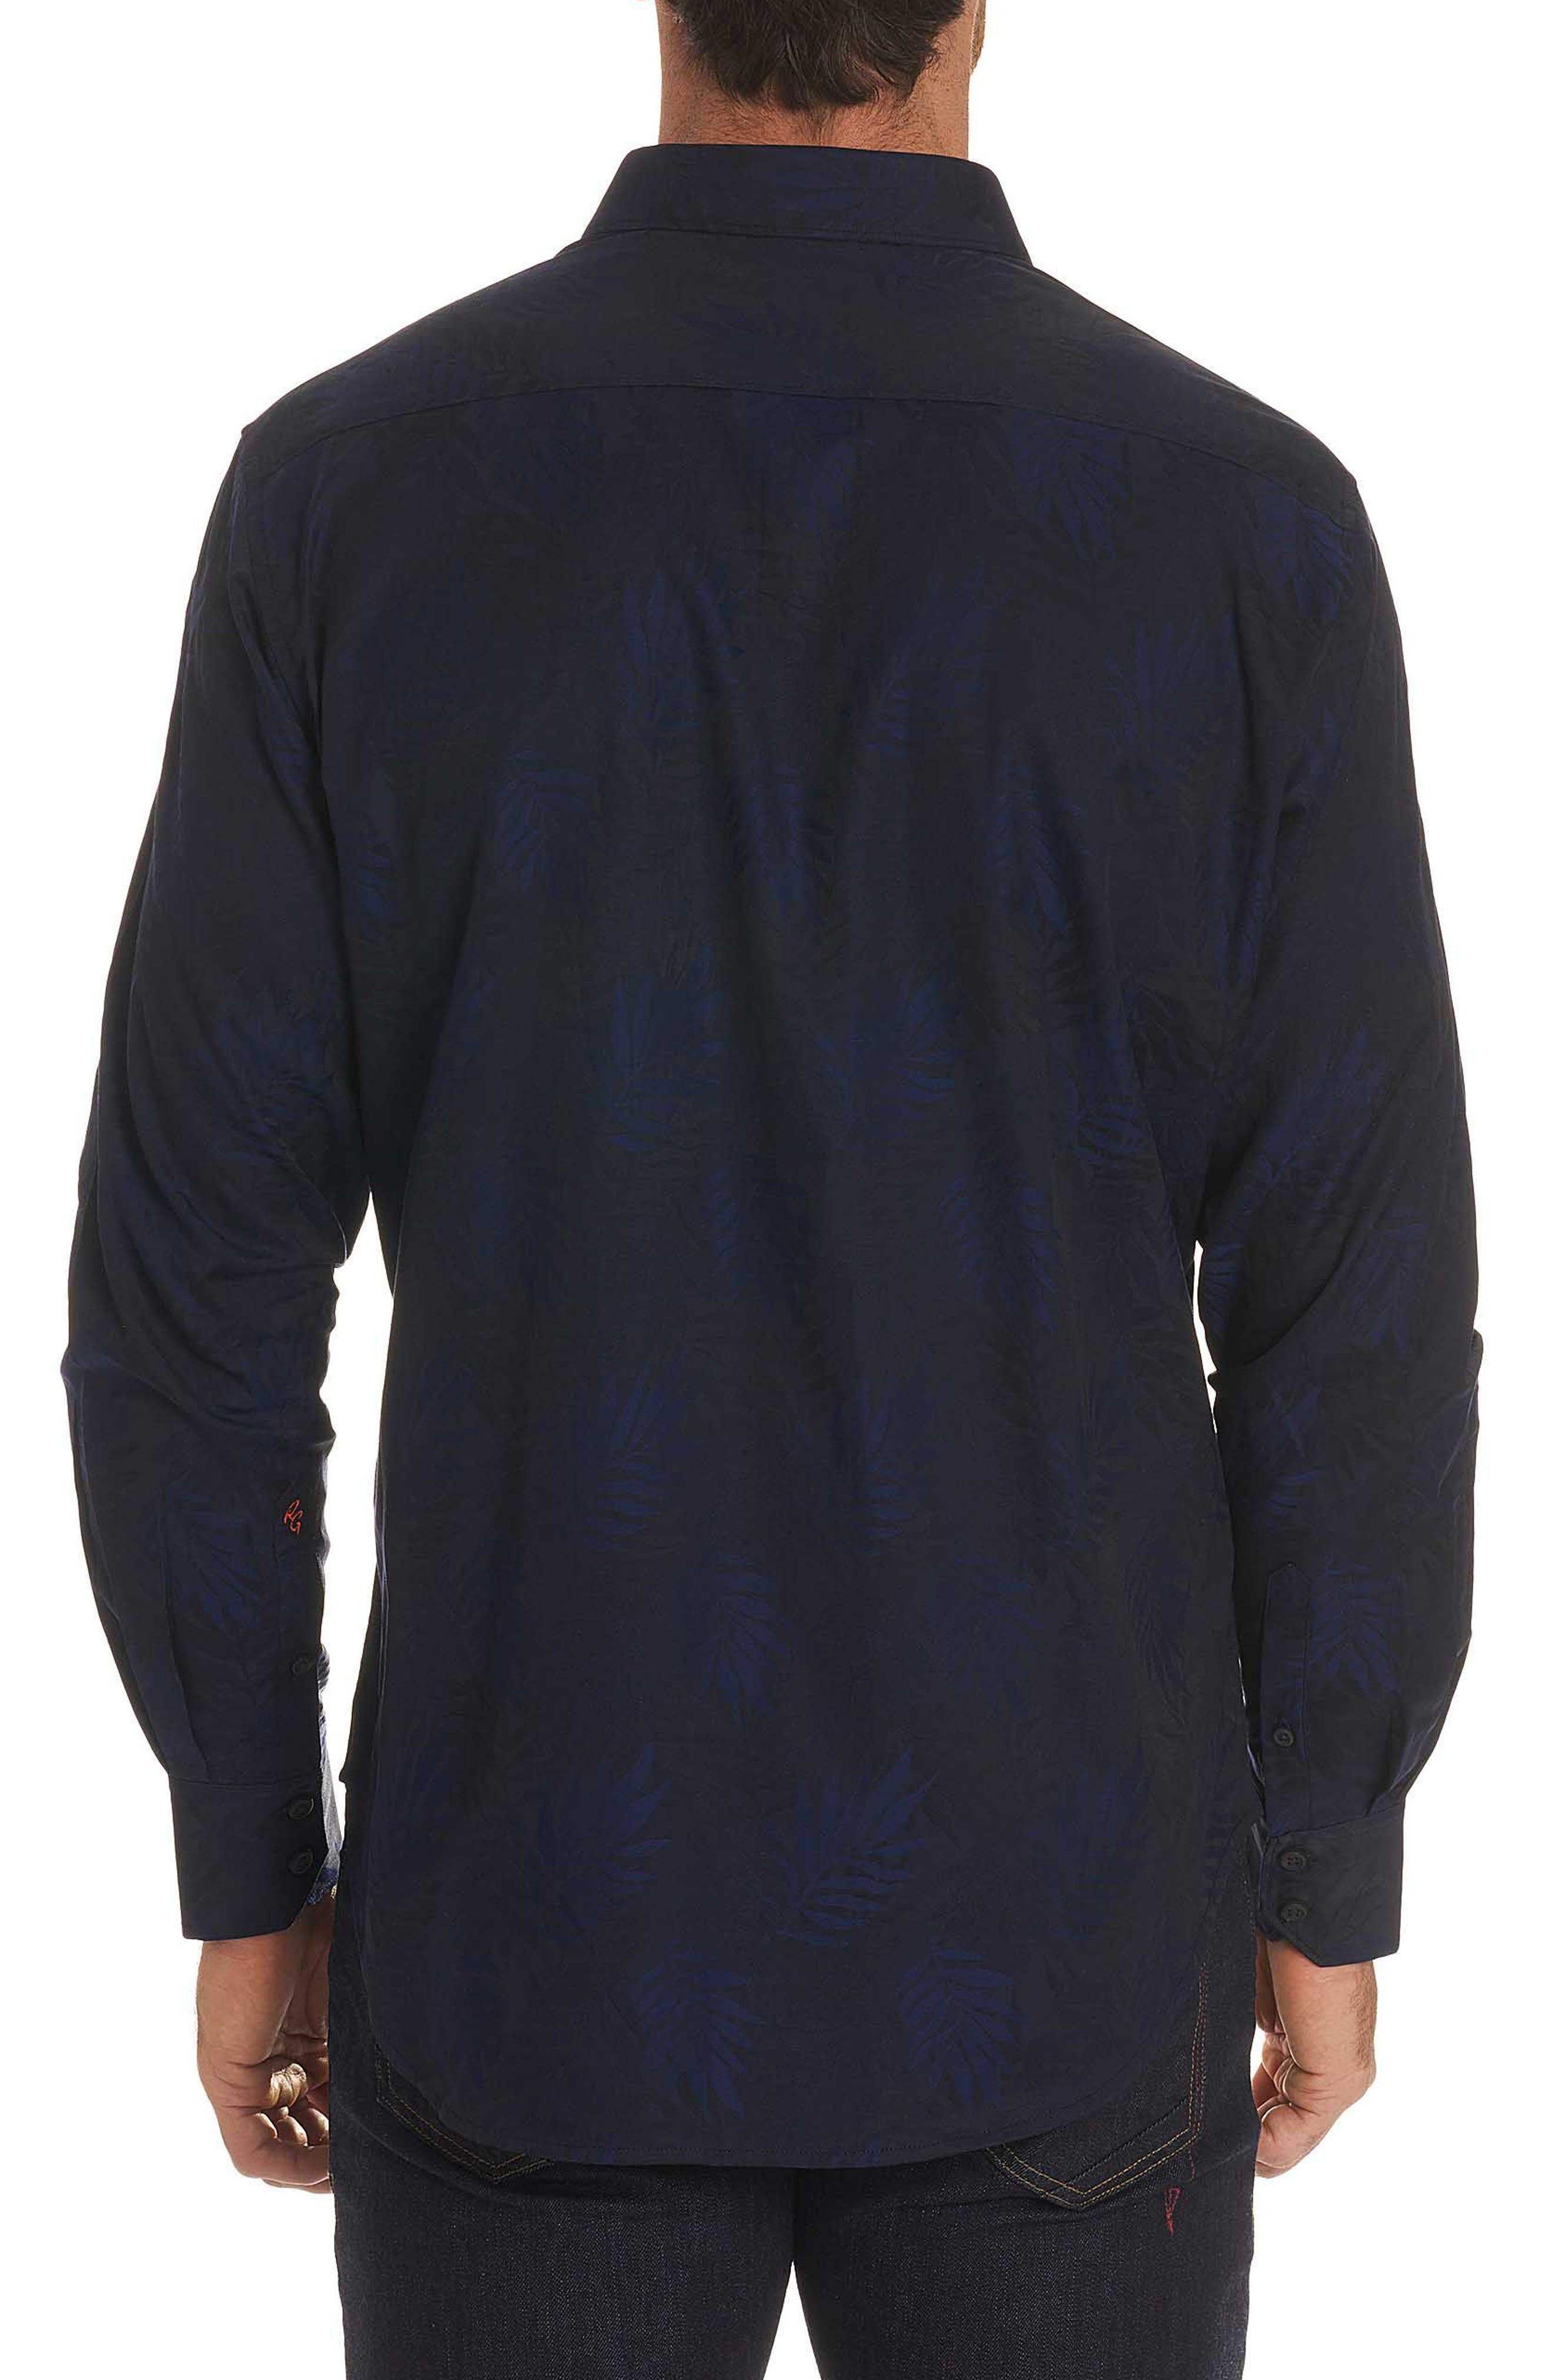 ROBERT GRAHAM,                             Monte Classic Fit Sport Shirt,                             Alternate thumbnail 2, color,                             402